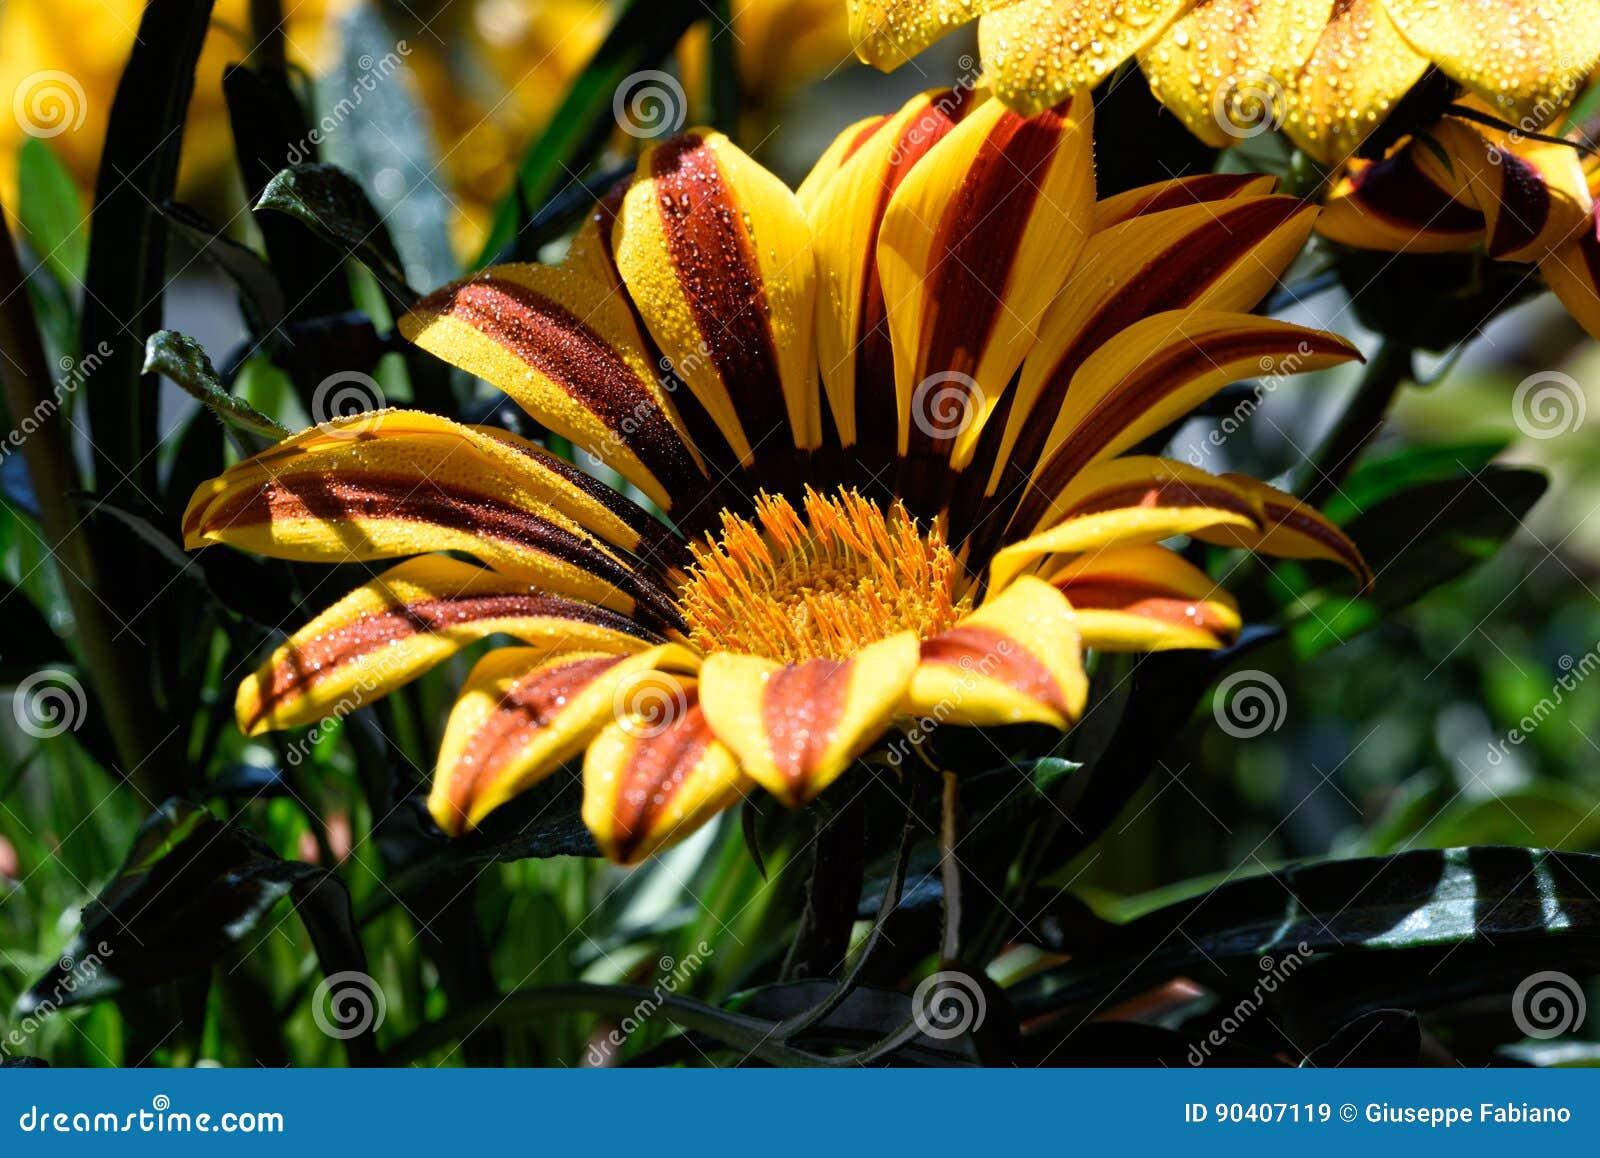 The concept of macro beauty of flowers xxxxiv stock image image of download the concept of macro beauty of flowers xxxxiv stock image image of color izmirmasajfo